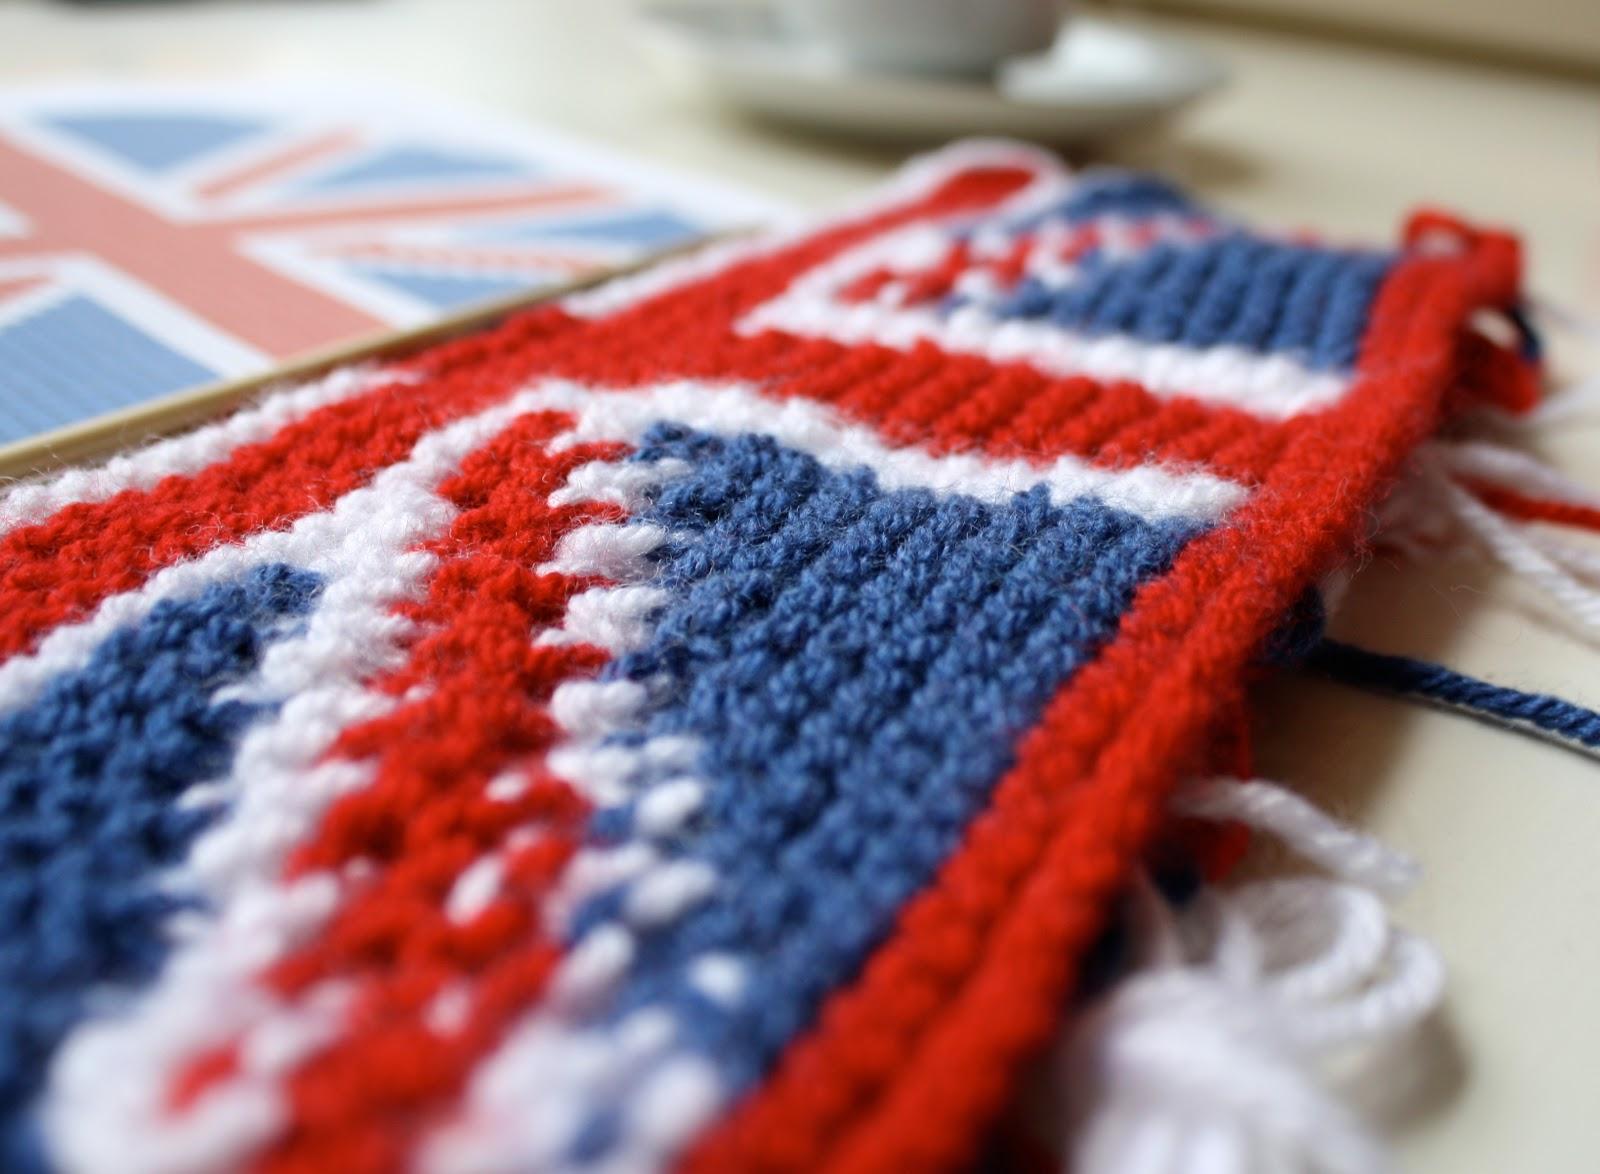 Knitting Pattern For Union Jack Tea Cosy : one sheepish girl: WIP Wednesday - Union Jack Tea Cosy